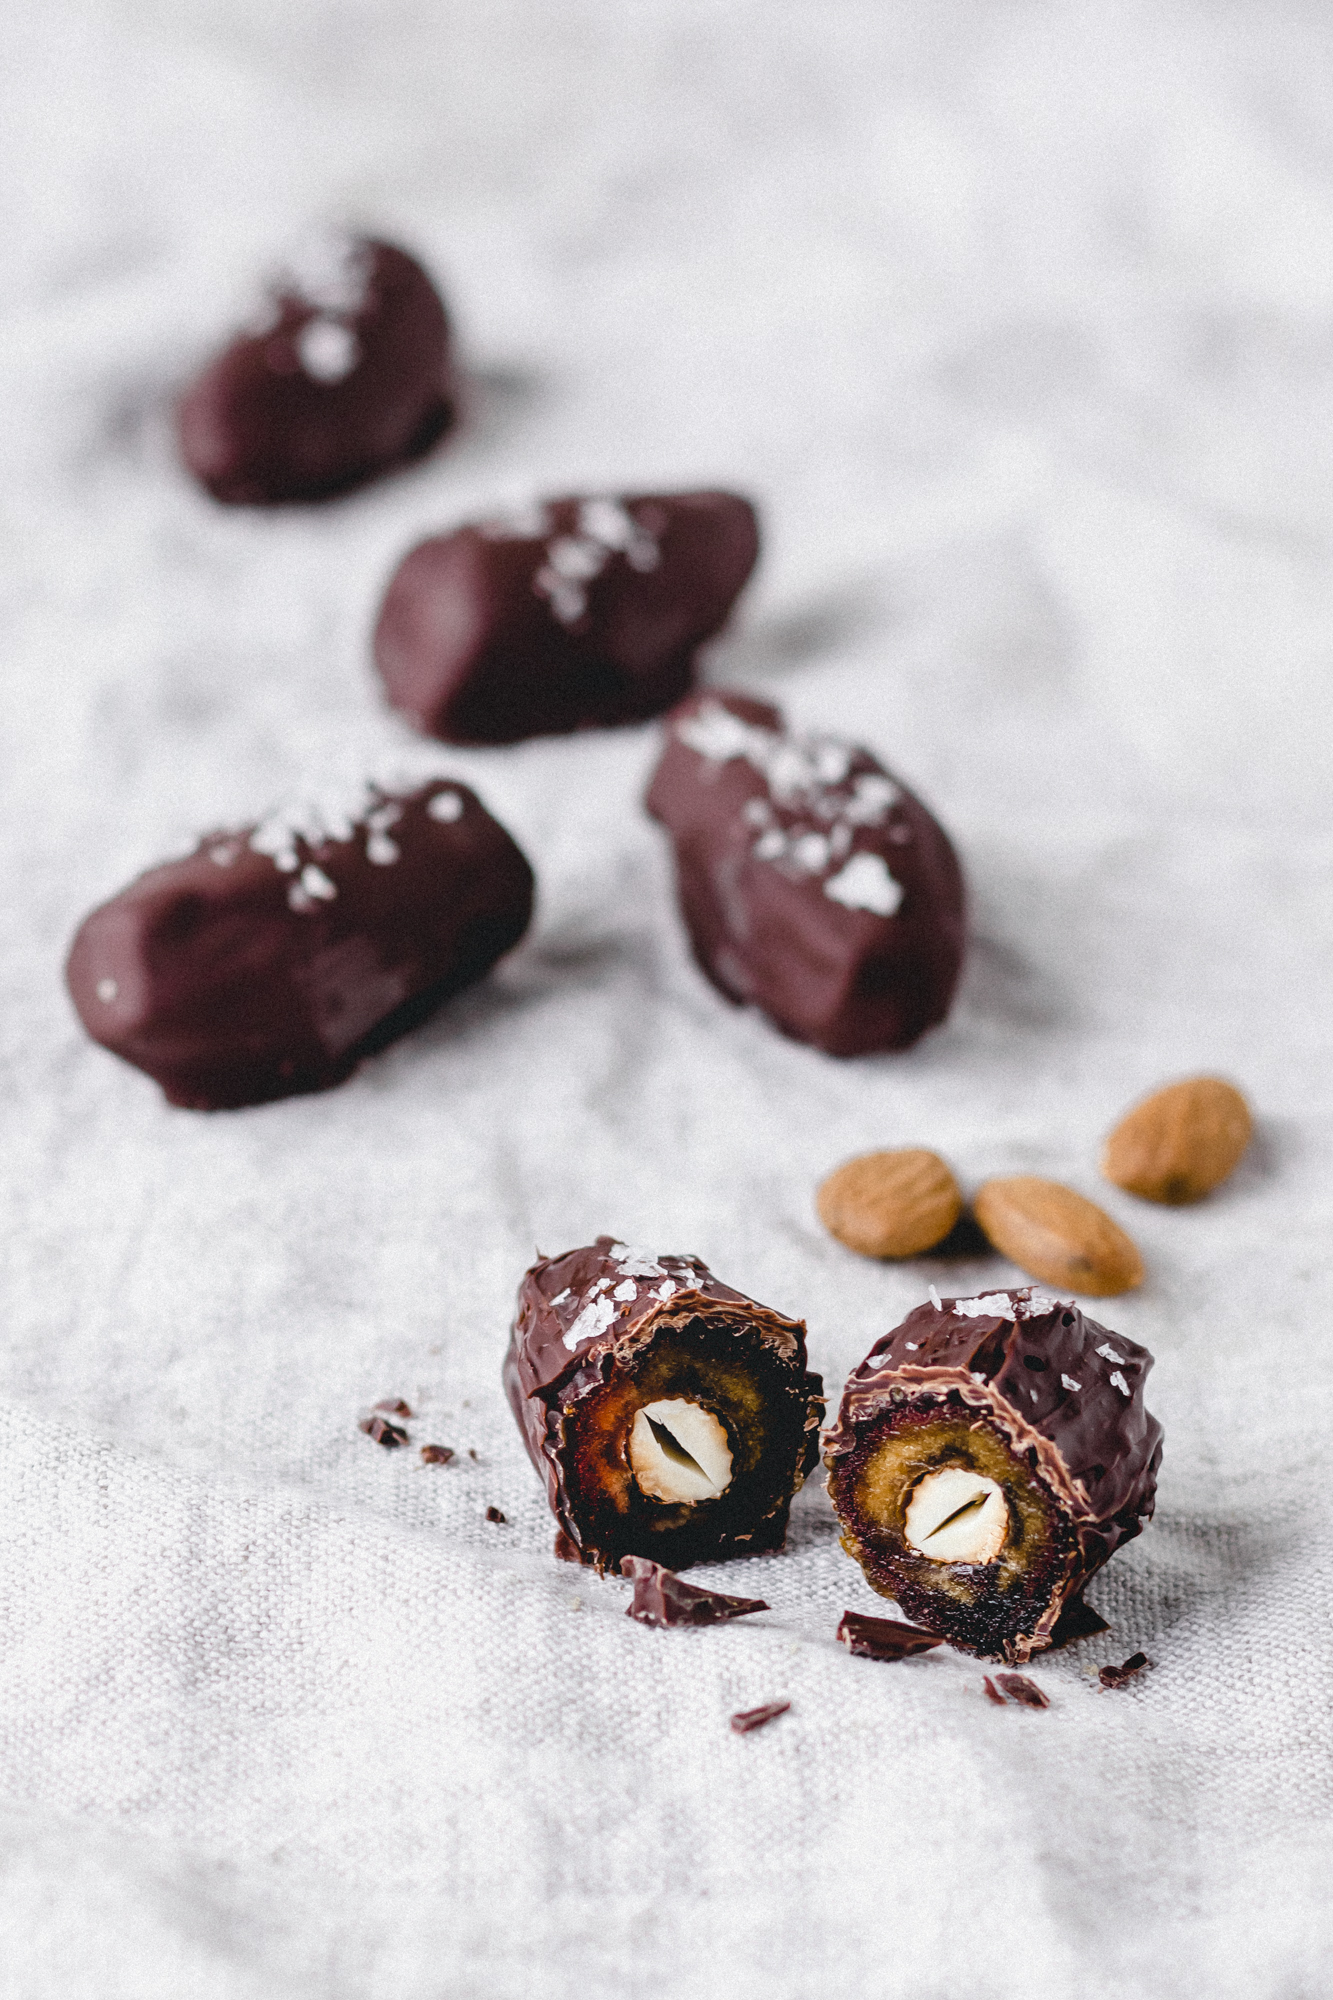 Vegan Salted Dark Chocolate Dates Stuffed With Almonds